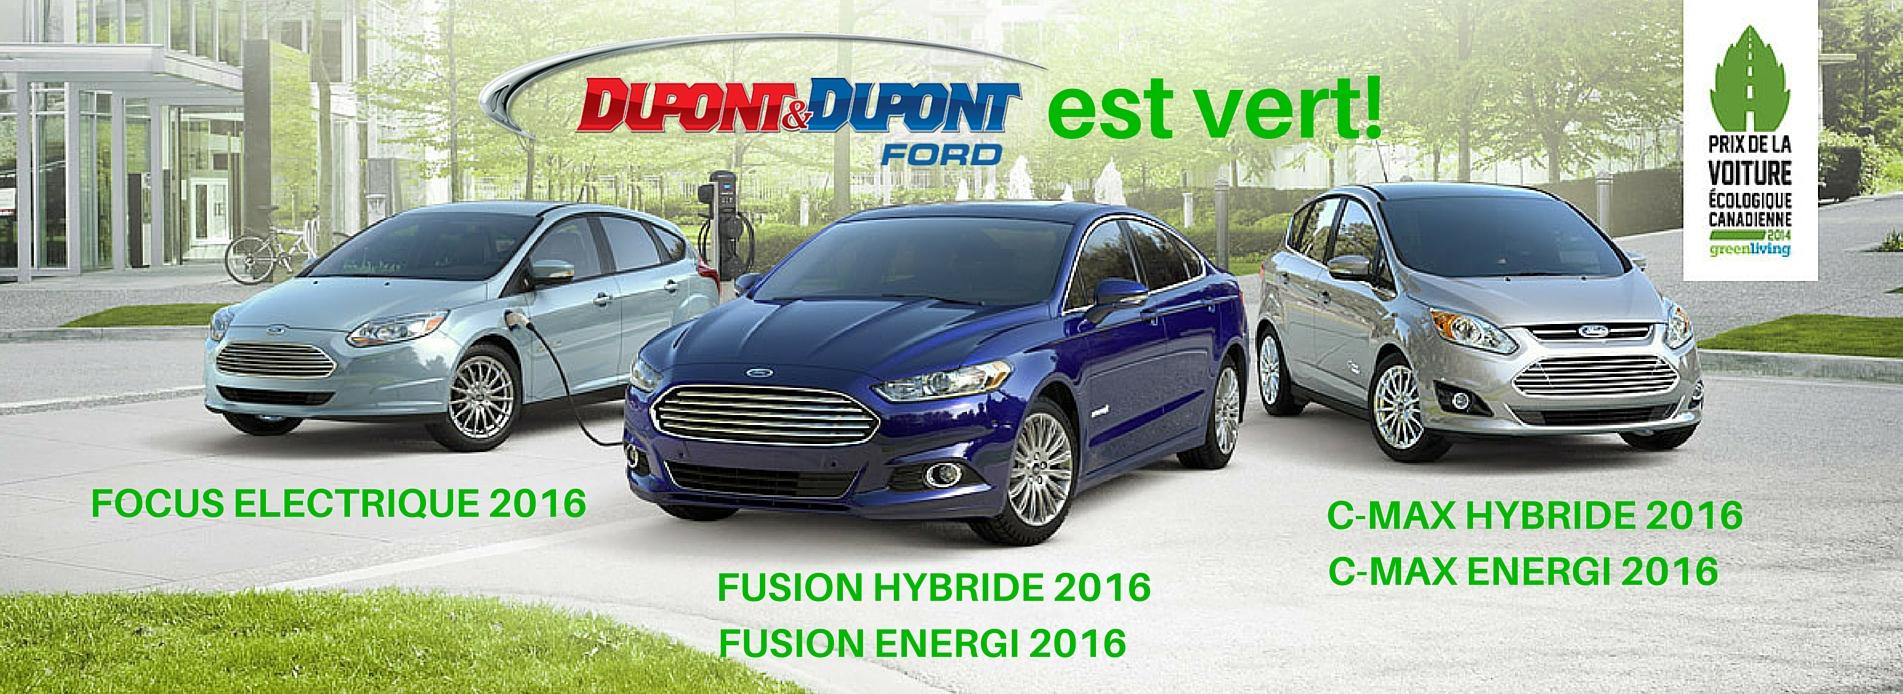 Auto hybride electrique ford gatineau ottawa